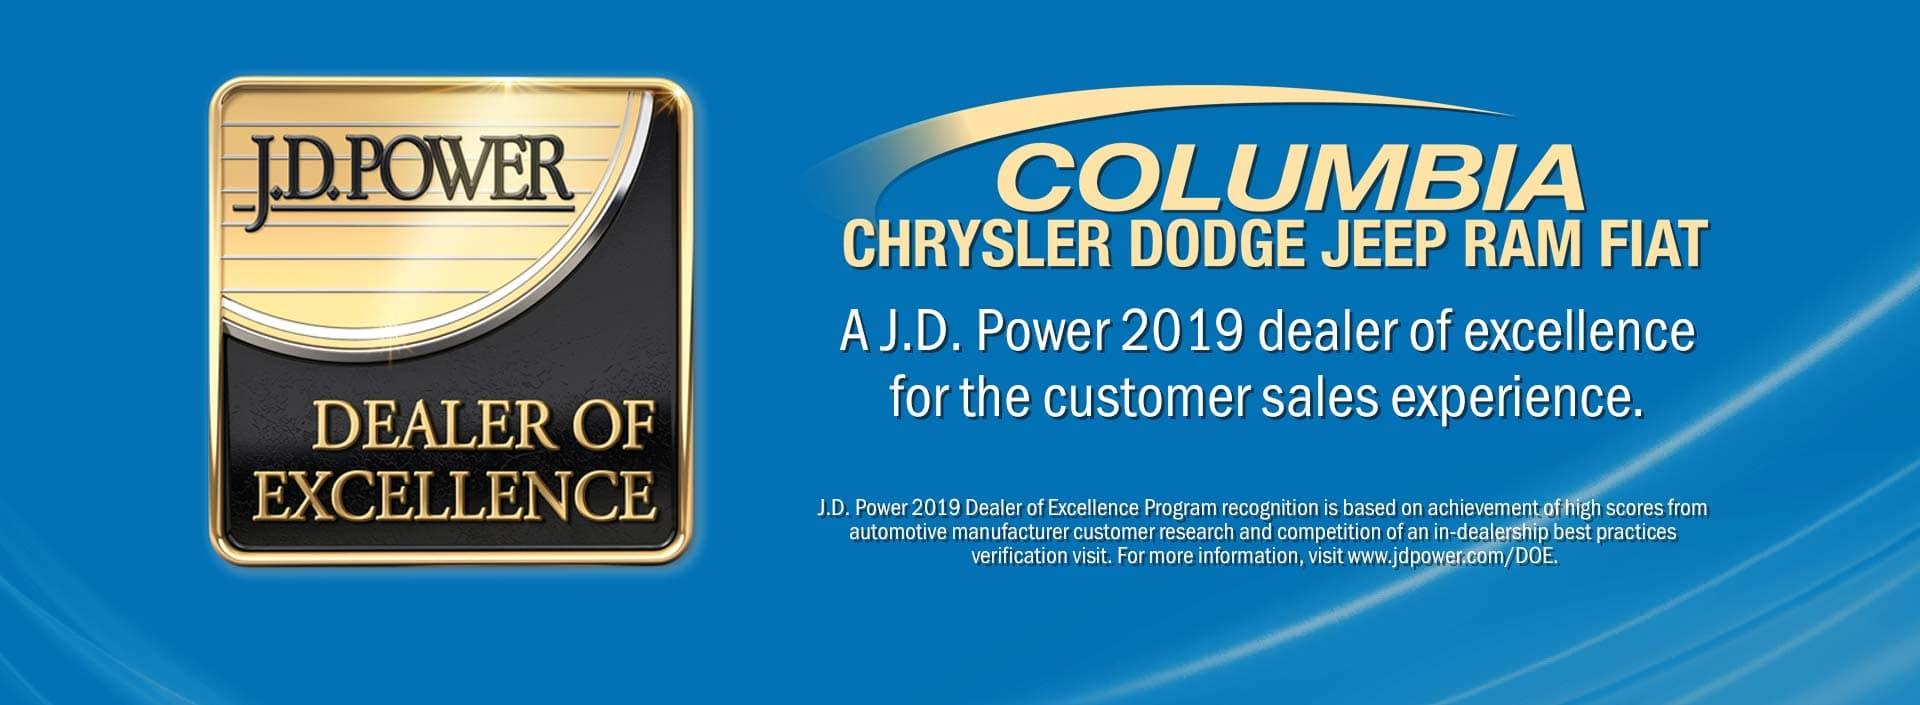 JD Power Award Columbia